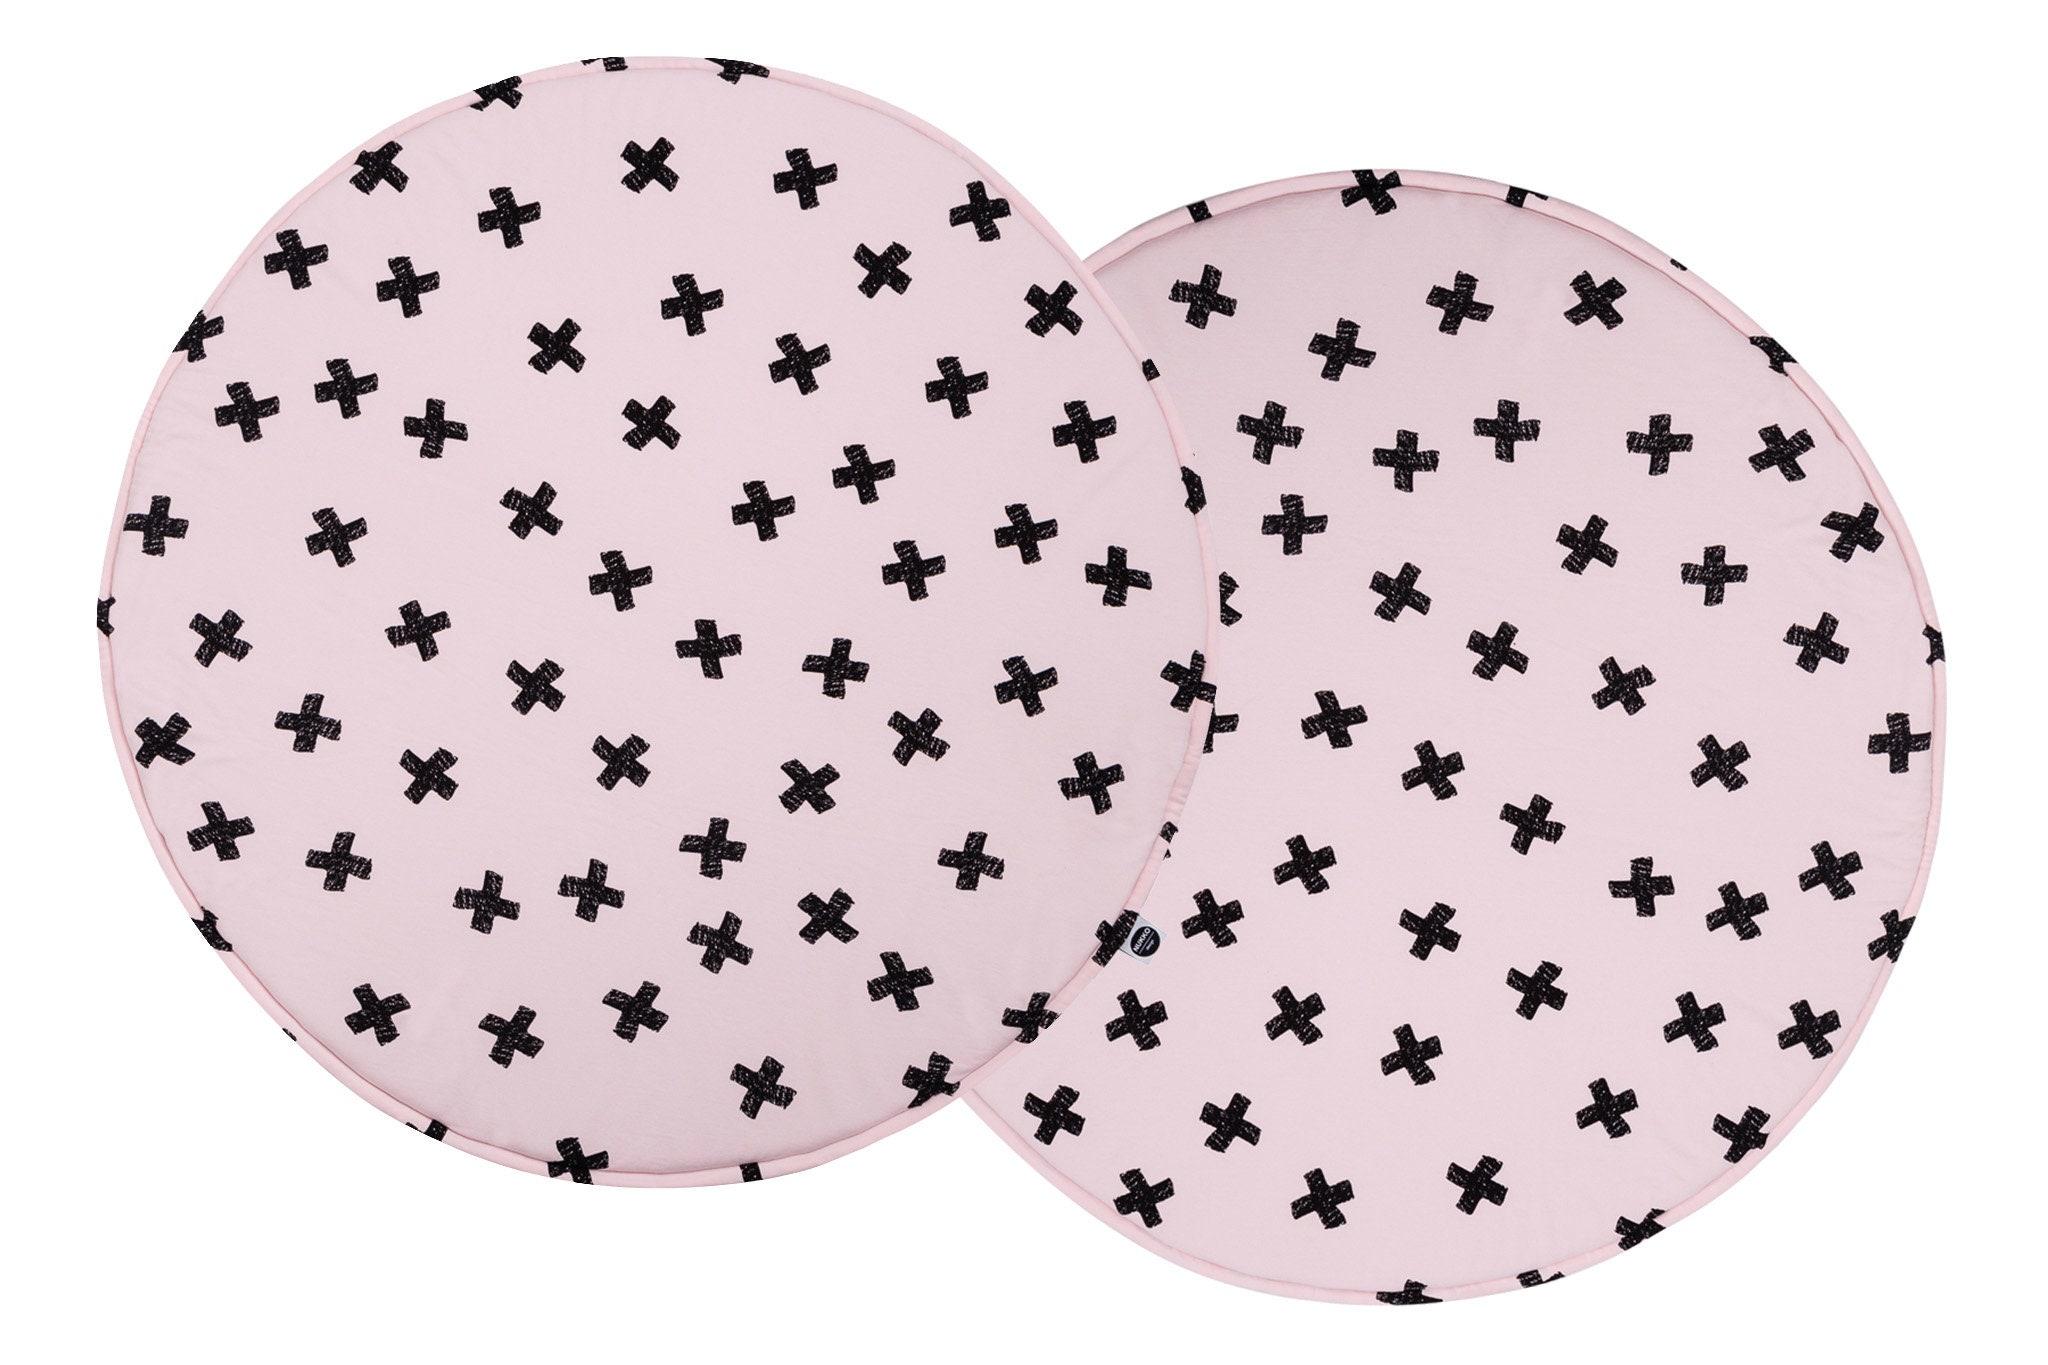 Padded Play Mat Powder Pink PlaMat baby Playmat Pluses Play